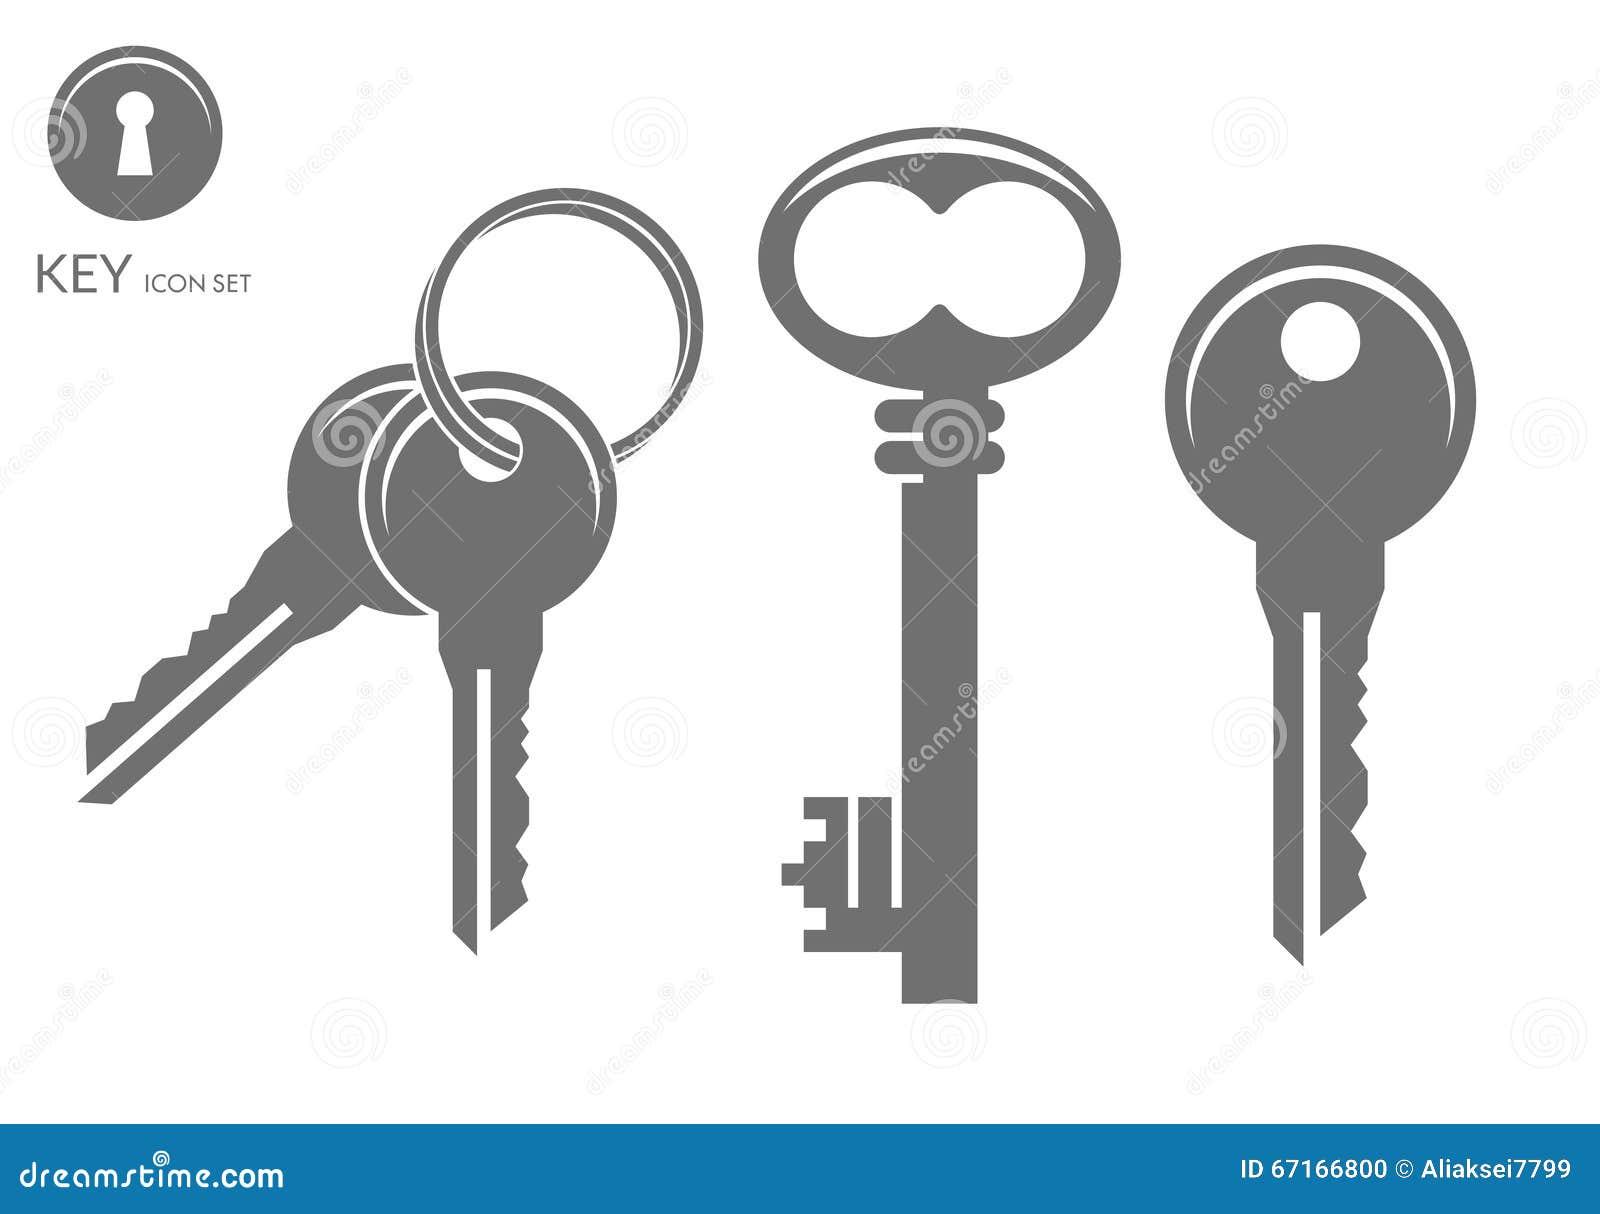 Vector Key Illustration: Key Icon Set Vector Illustration